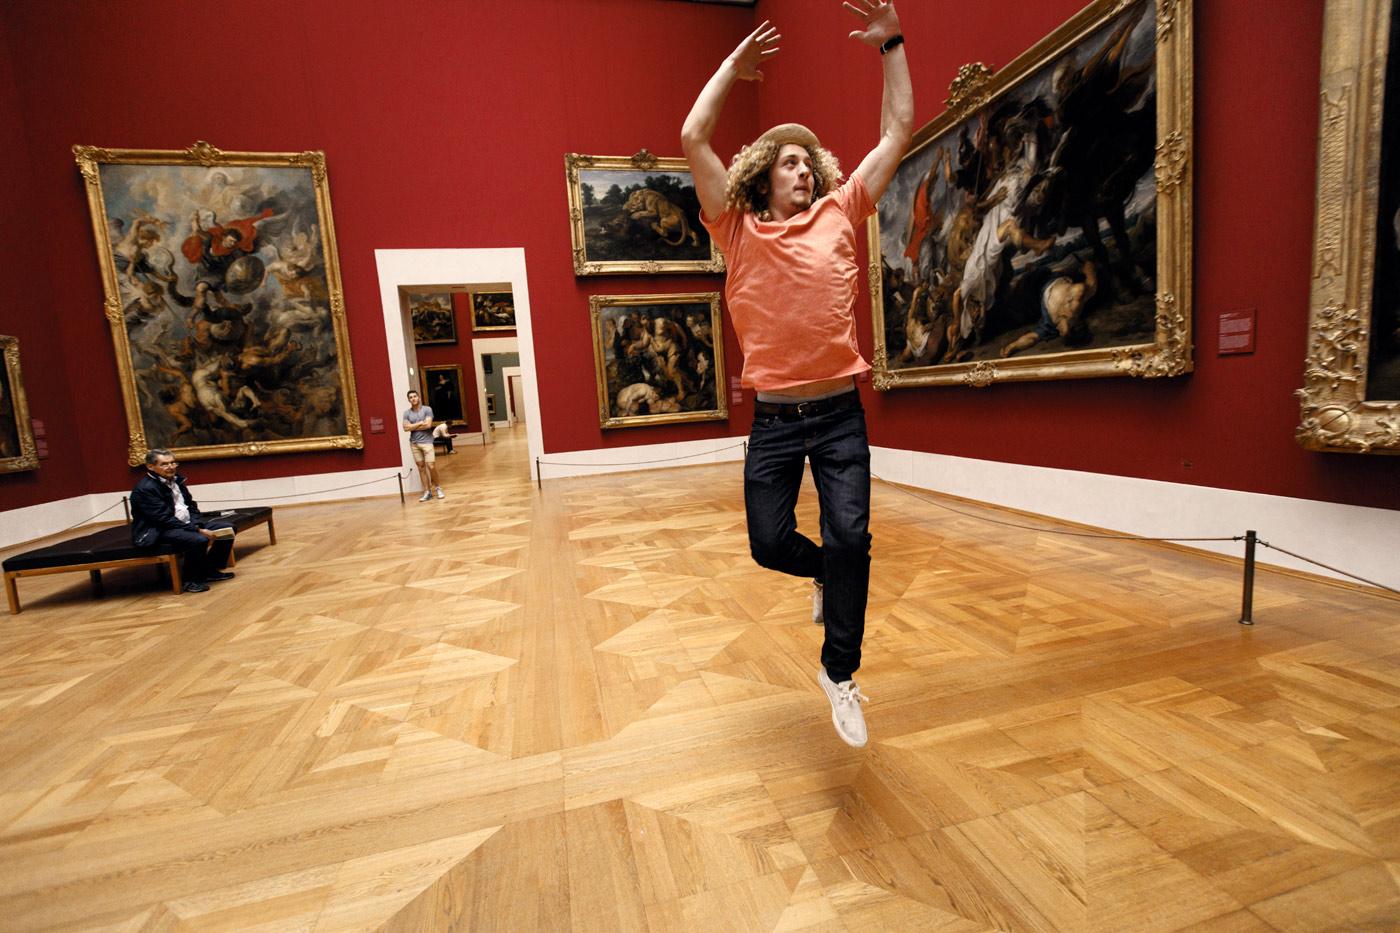 Museum Unfug